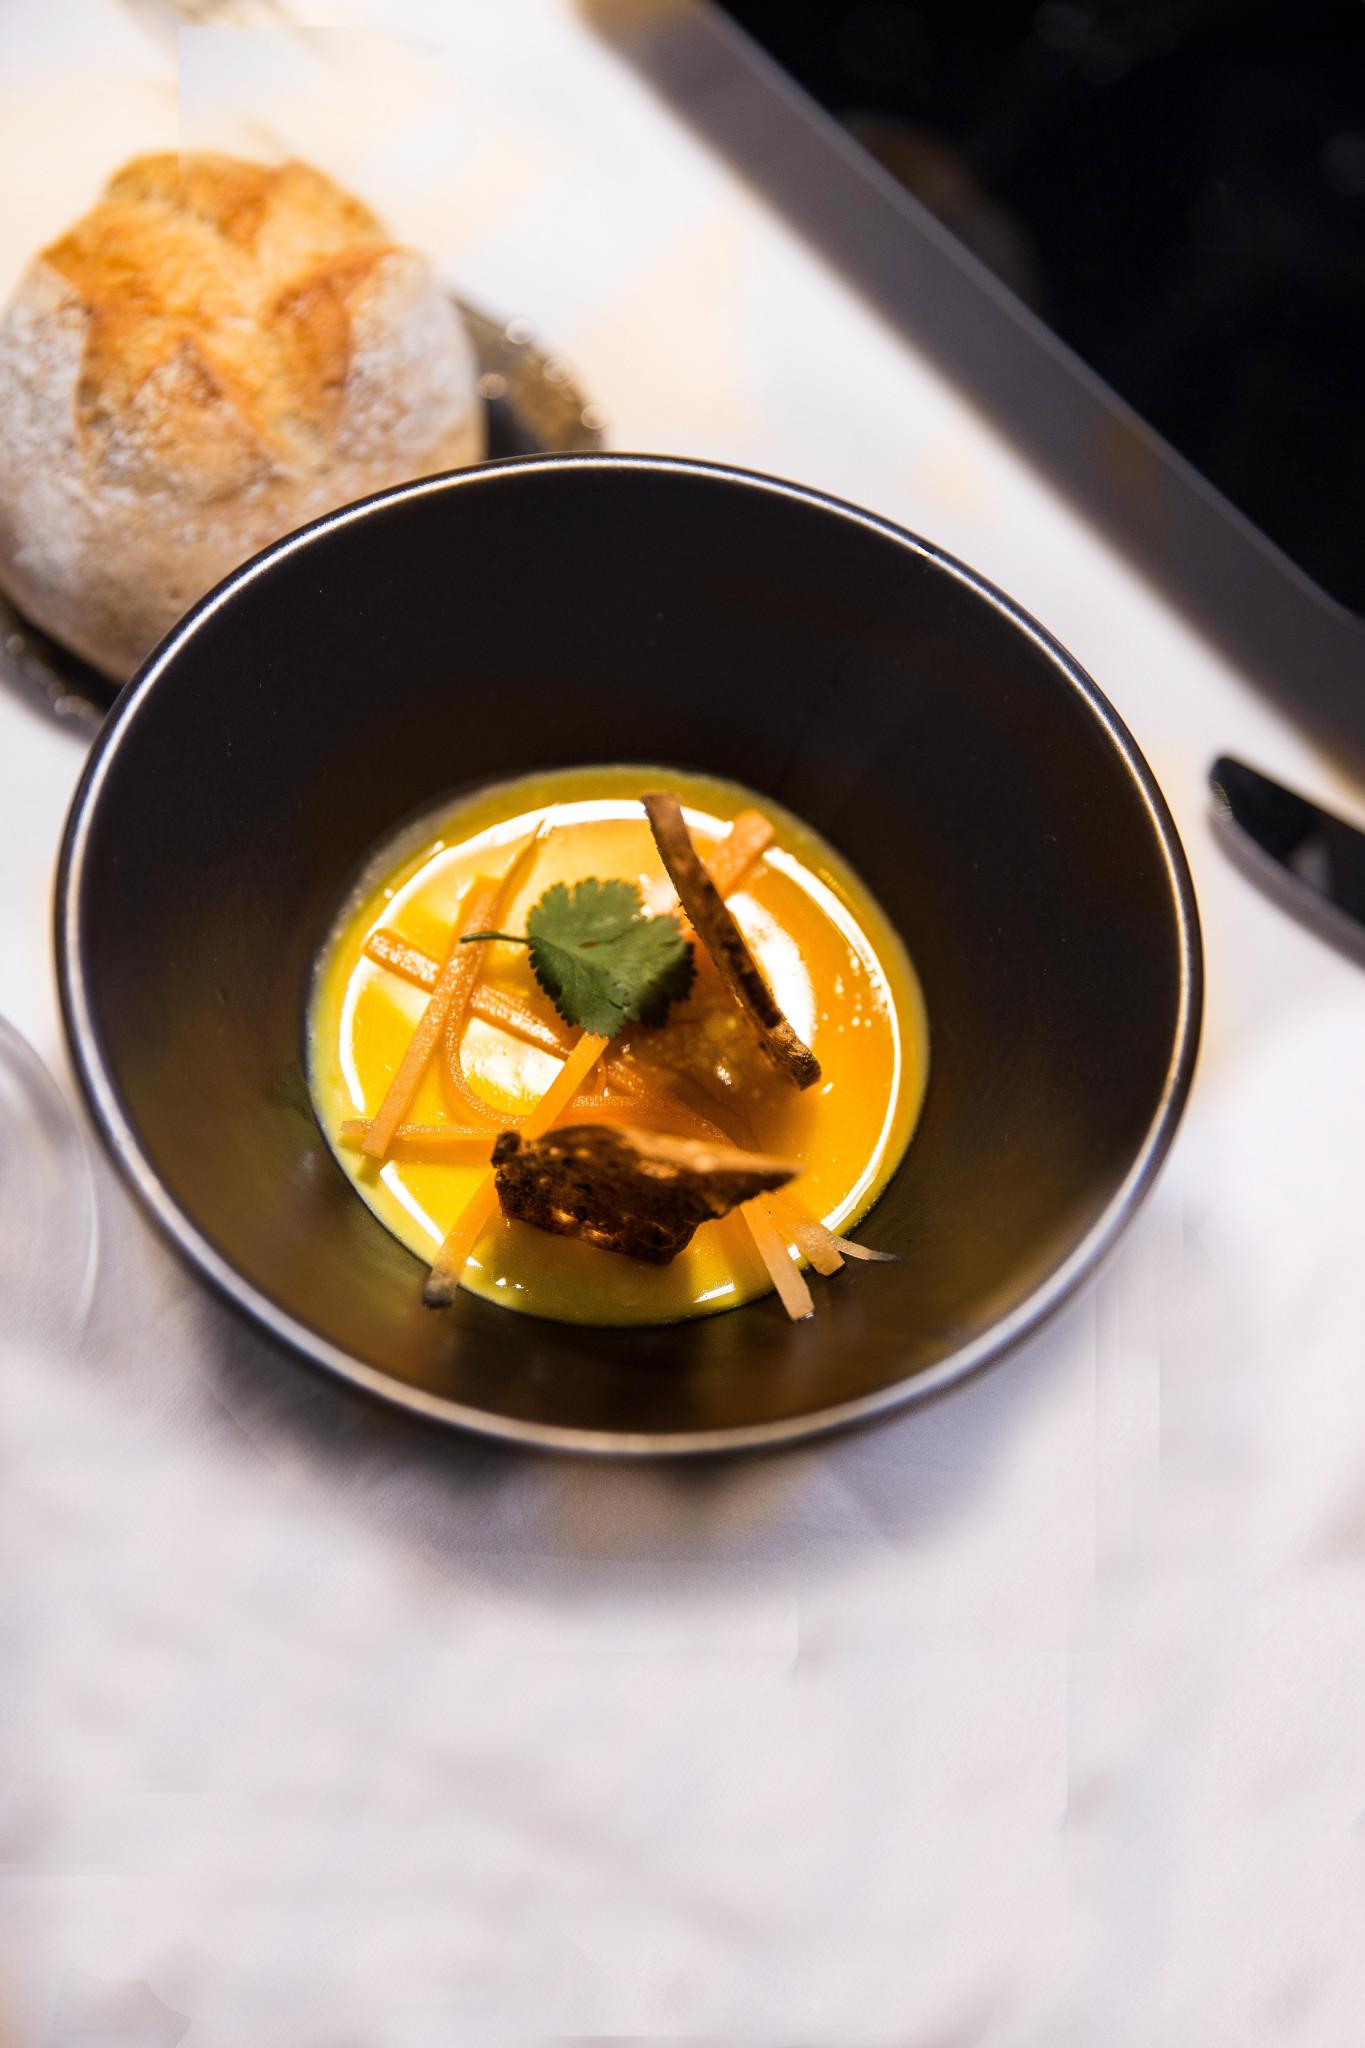 Royale de foie gras, transparence orange safran Jeremy galvan DEF